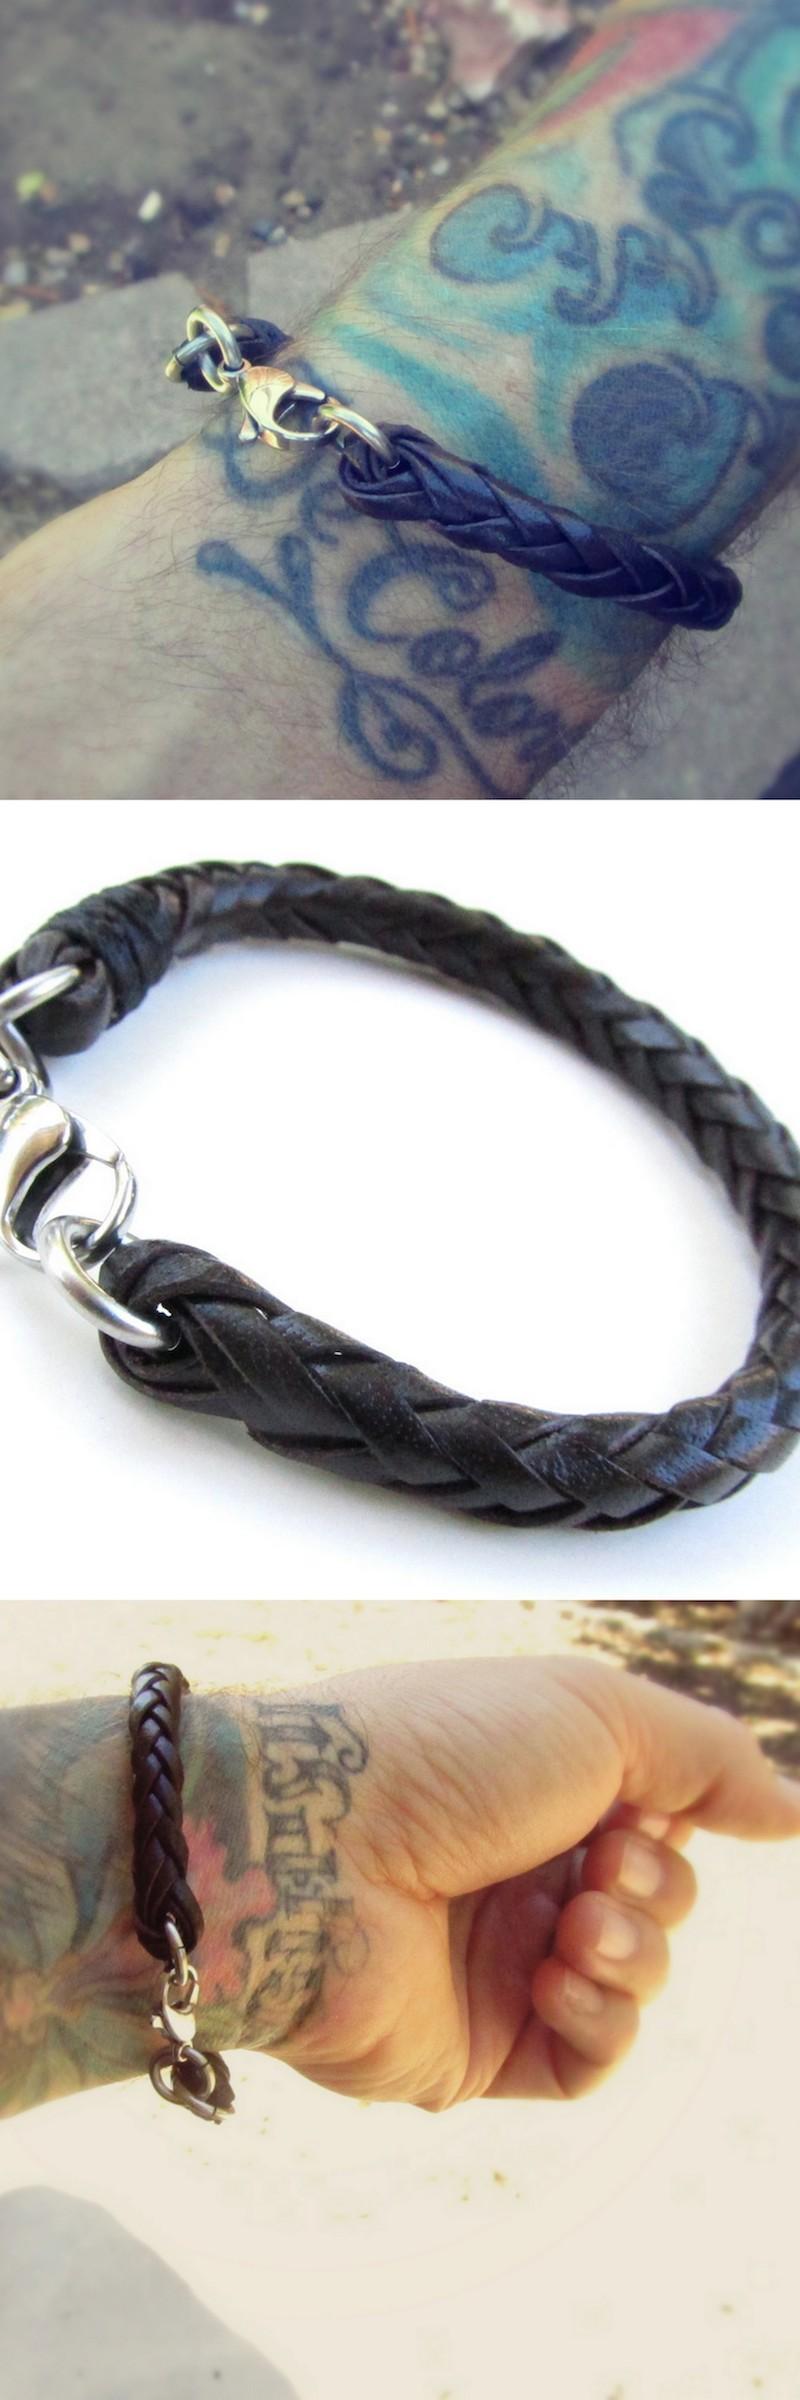 Mens braided leather bracelet tattoo sanfilippoleather